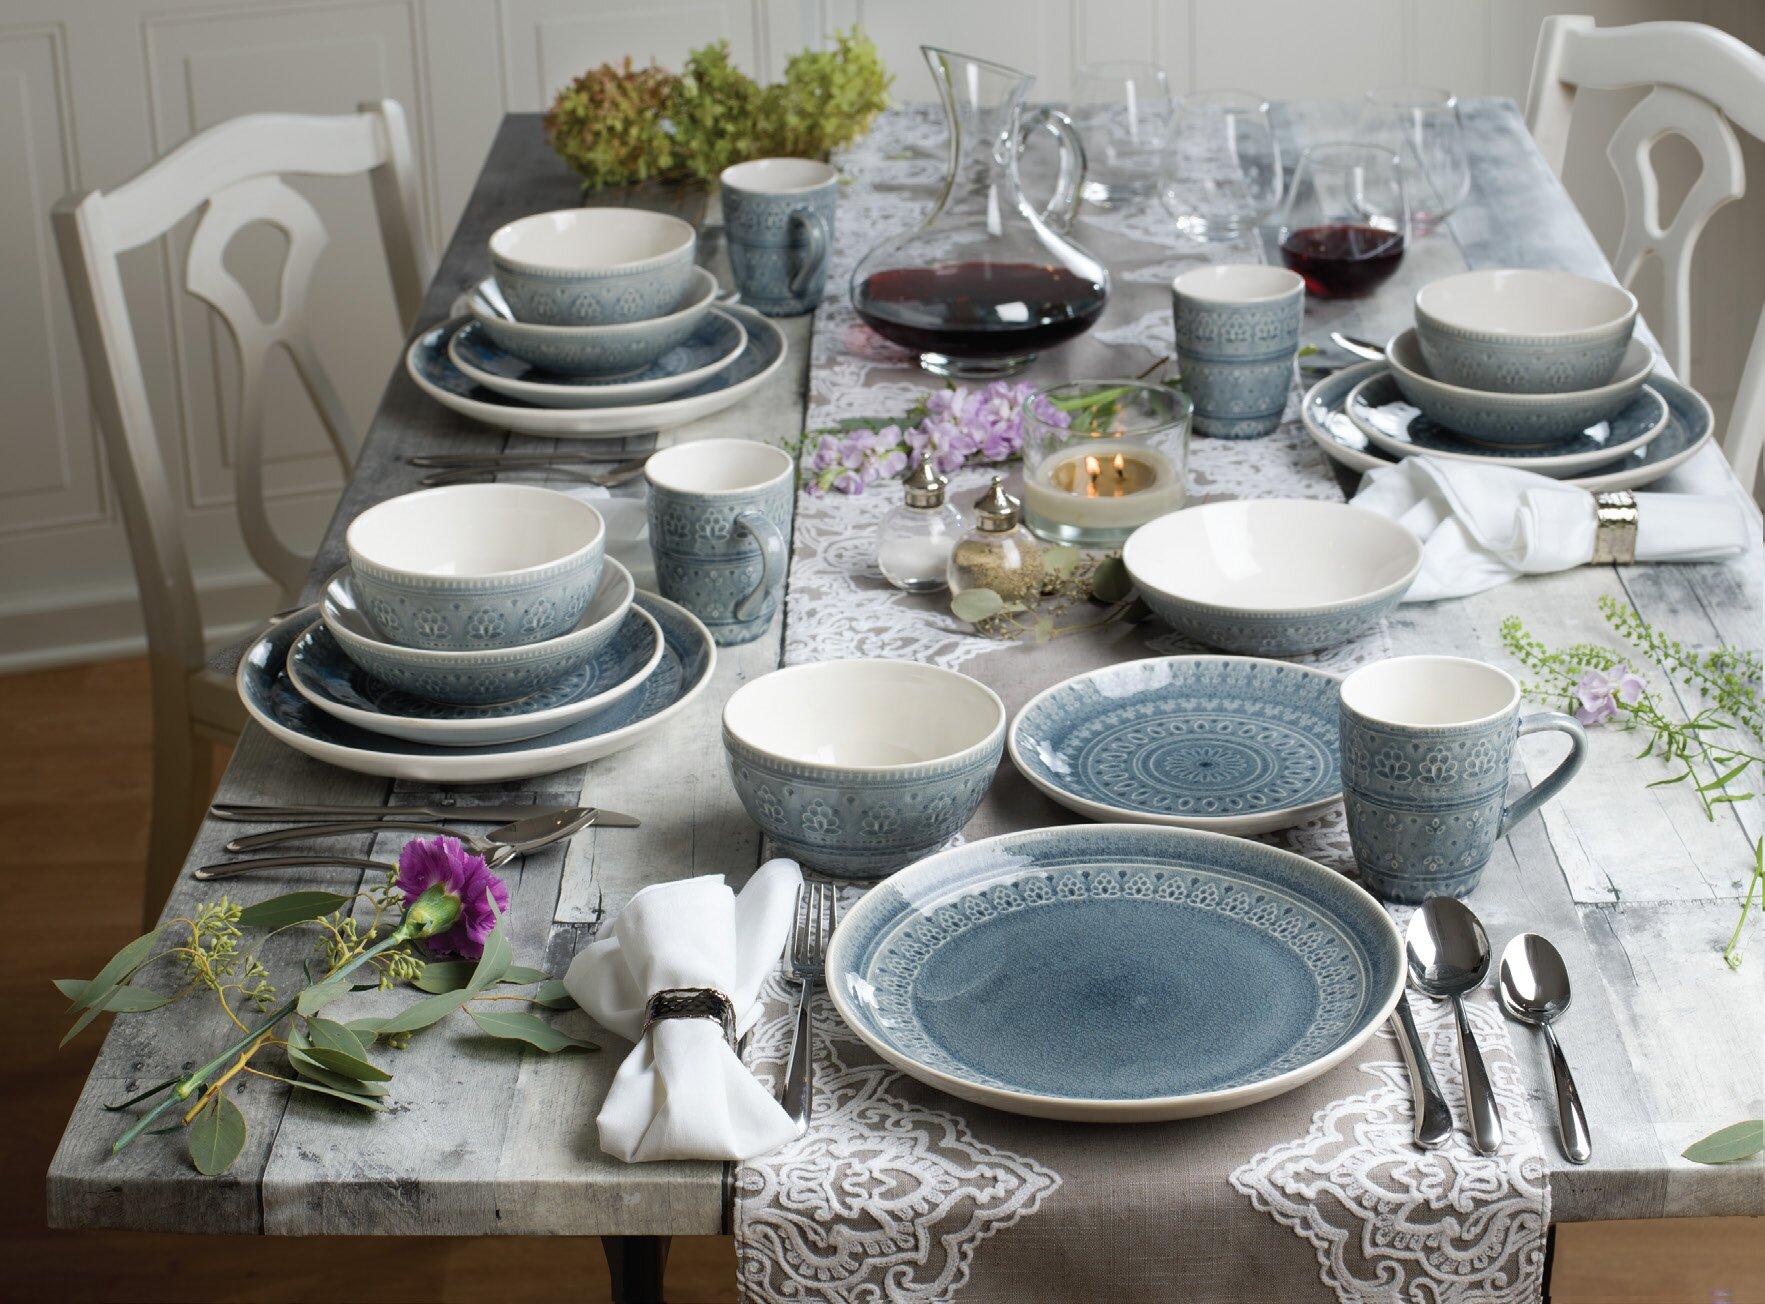 & Zeibak 20 Piece Dinnerware Set Service for 4 u0026 Reviews | Joss u0026 Main